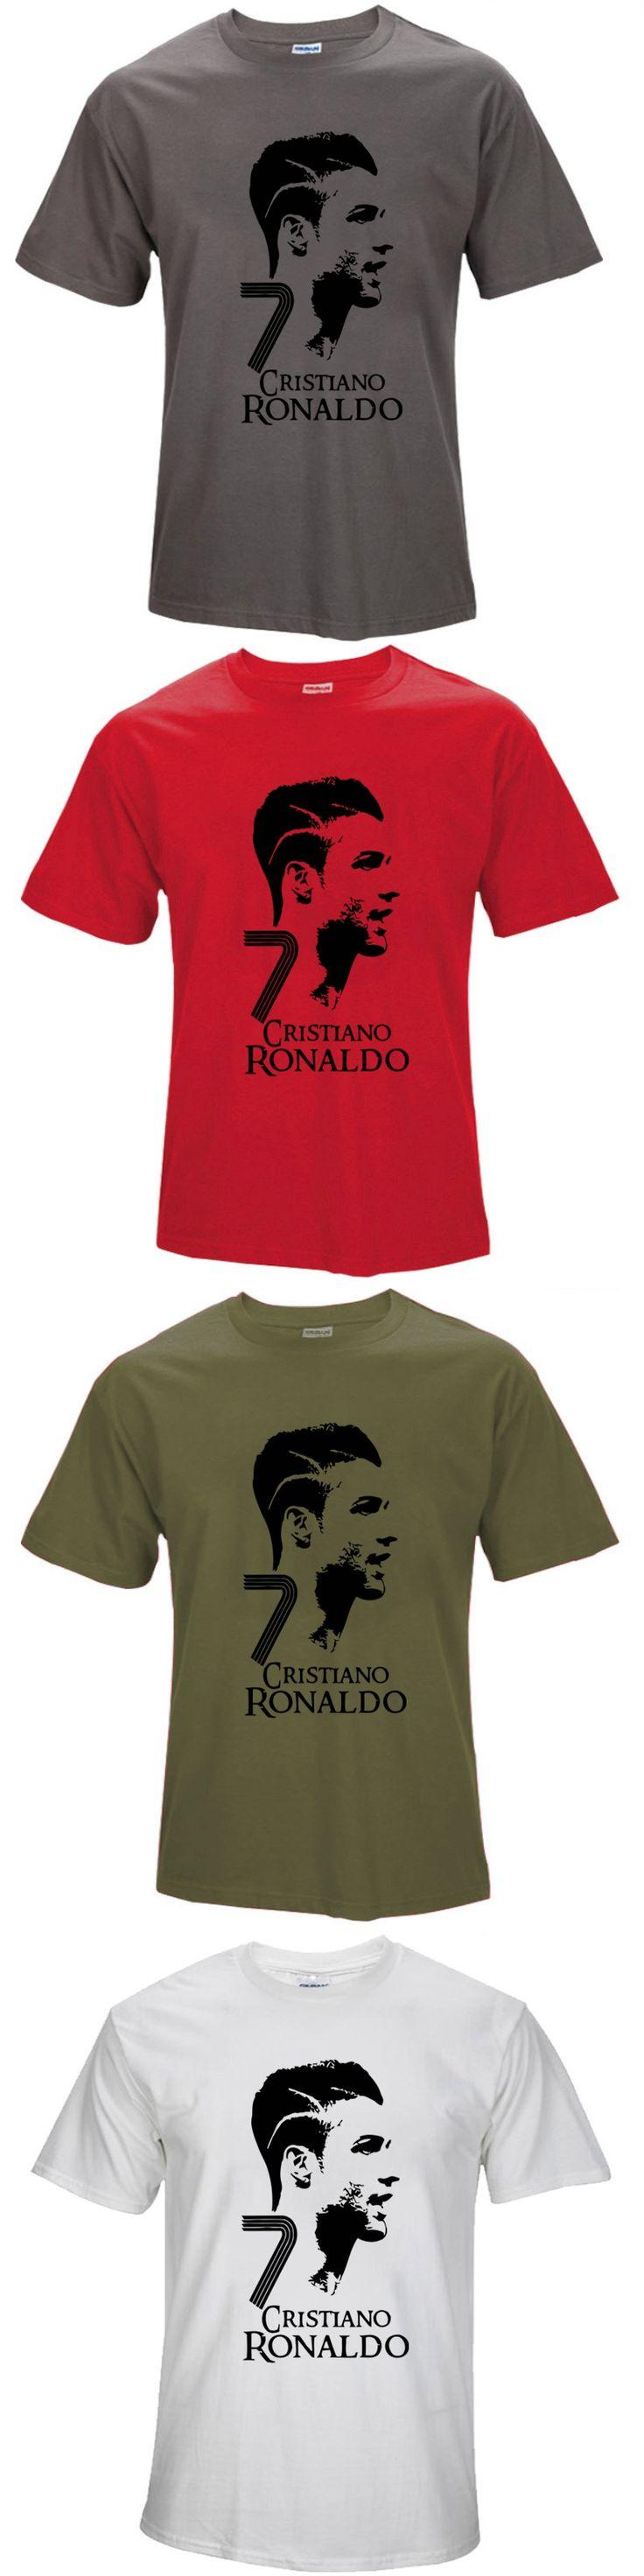 2016 Summer World Cup Cristiano Ronaldo men's T-shirt survetement footbal bodybuilding camiseta barcelonae barcelona t shirt